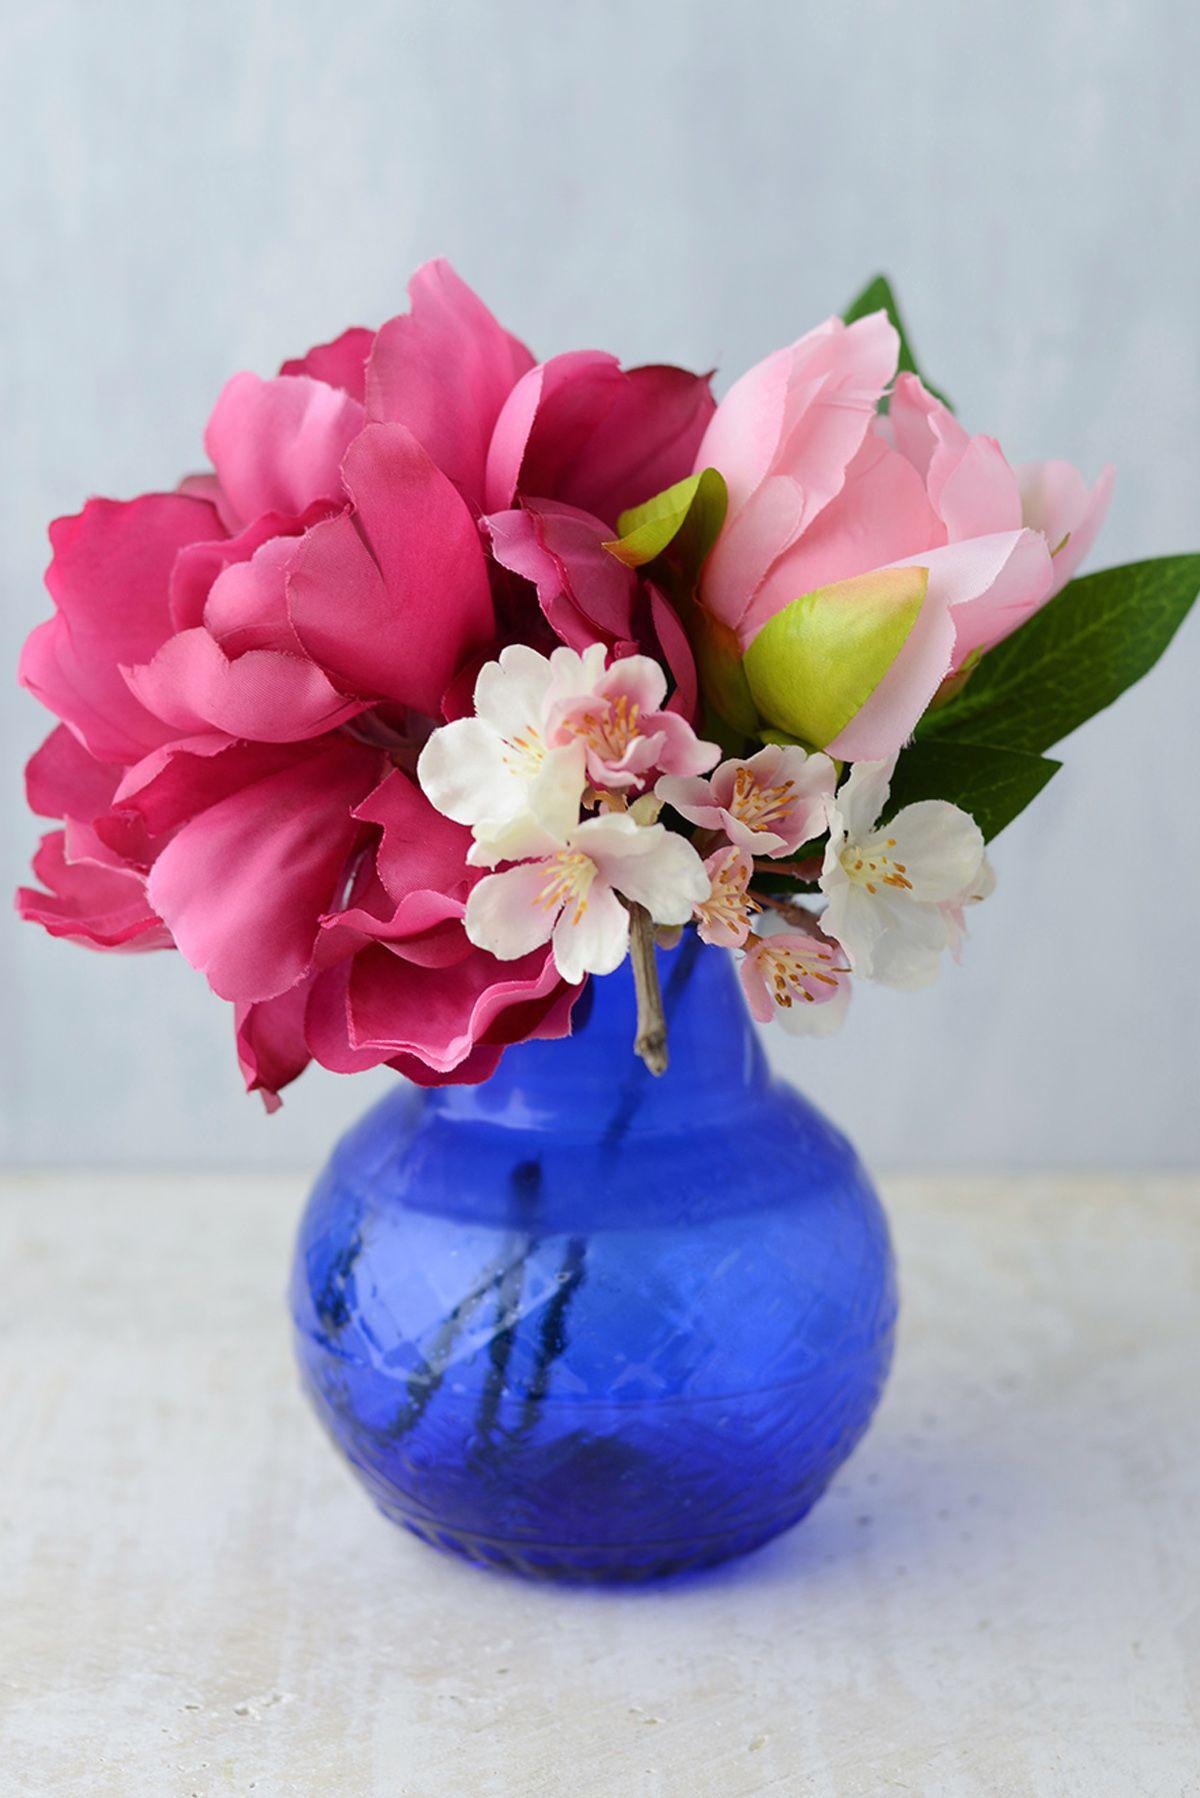 15 attractive Cobalt Blue Glass Flower Vases 2021 free download cobalt blue glass flower vases of cobalt blue glass 5 vase dream home pinterest cobalt blue in cobalt blue glass 5 vase